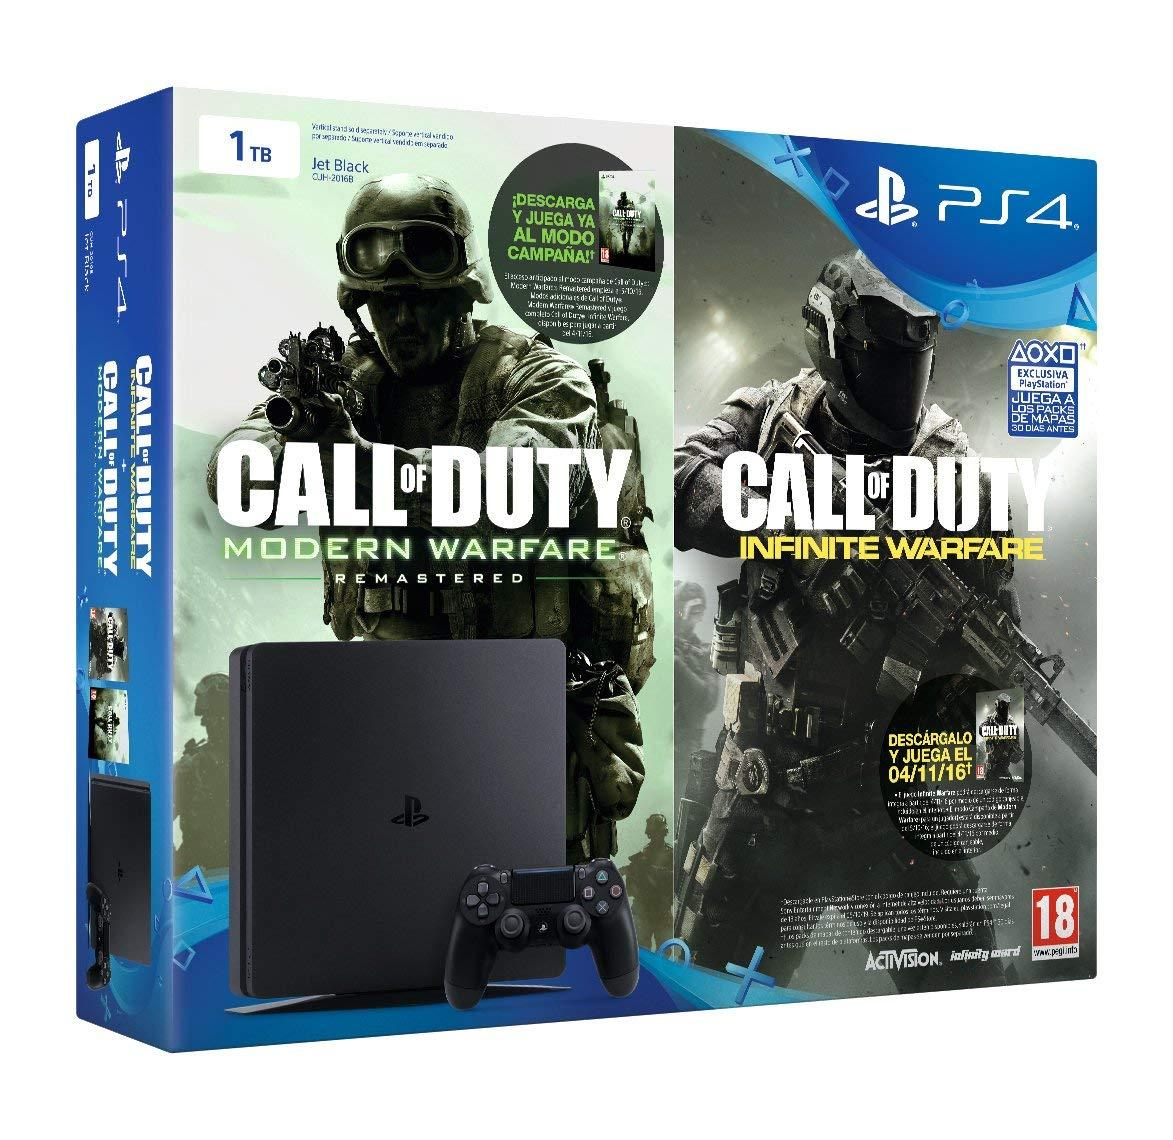 PlayStation 4 Slim (PS4) 1TB (Reacondicionada) + Call Of Duty: Infinite Warfare + Call Of Duty